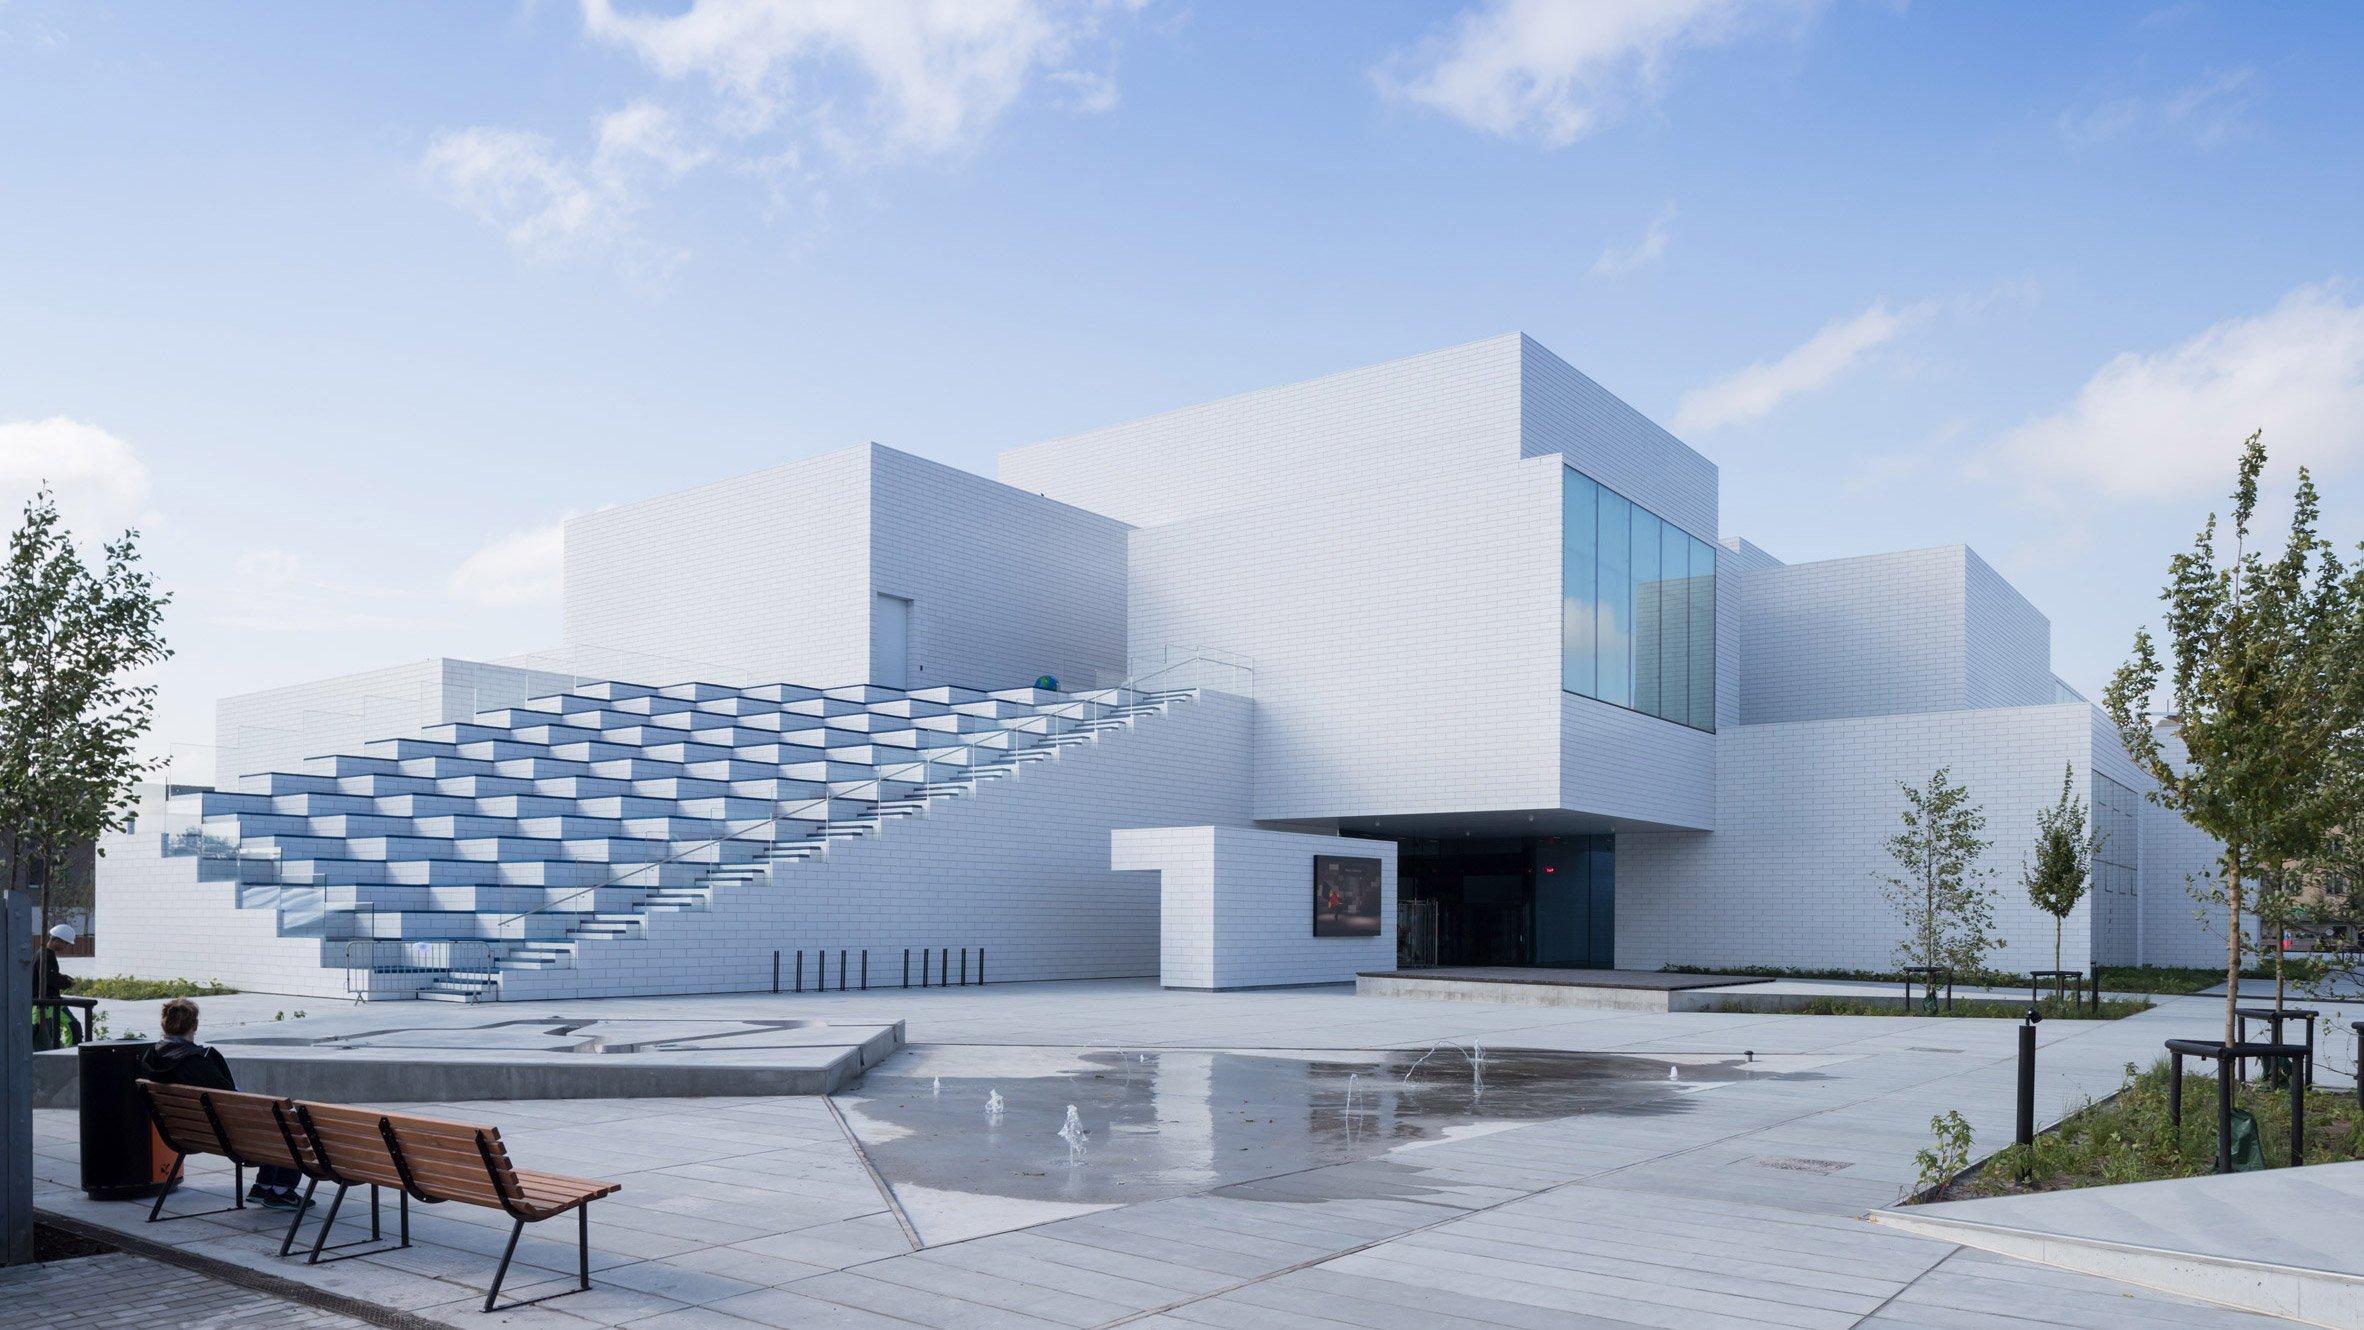 lego-house-big-photographs-iwan-baan-billund-denmark-architecture_dezeen_hero3.jpg